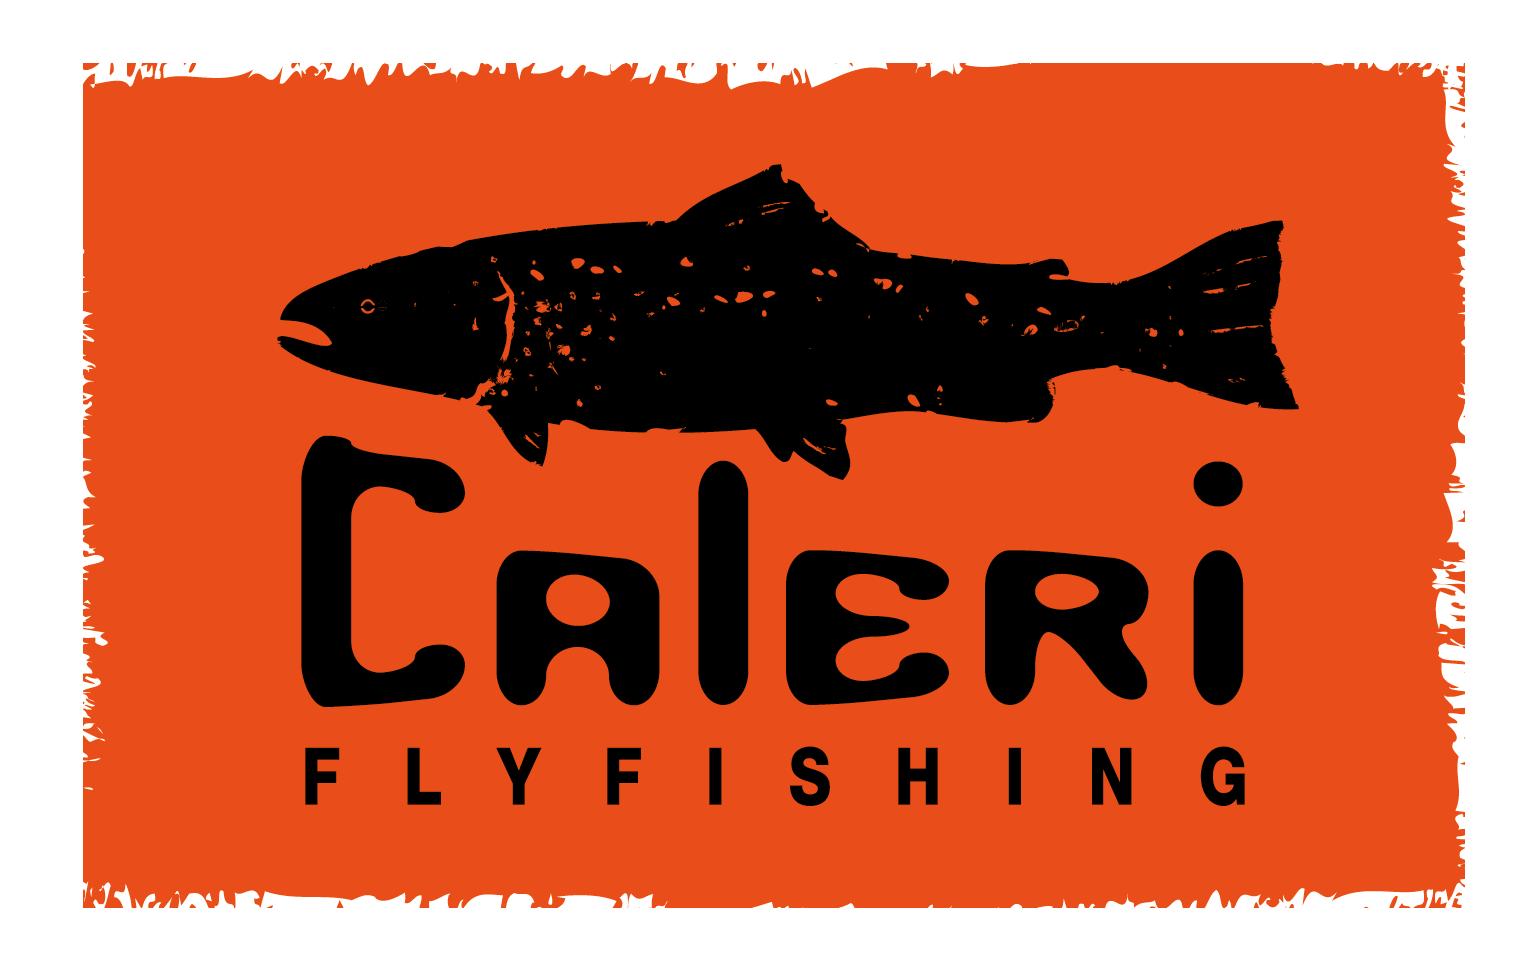 Logo de l'entreprise Caleri FlyFishing